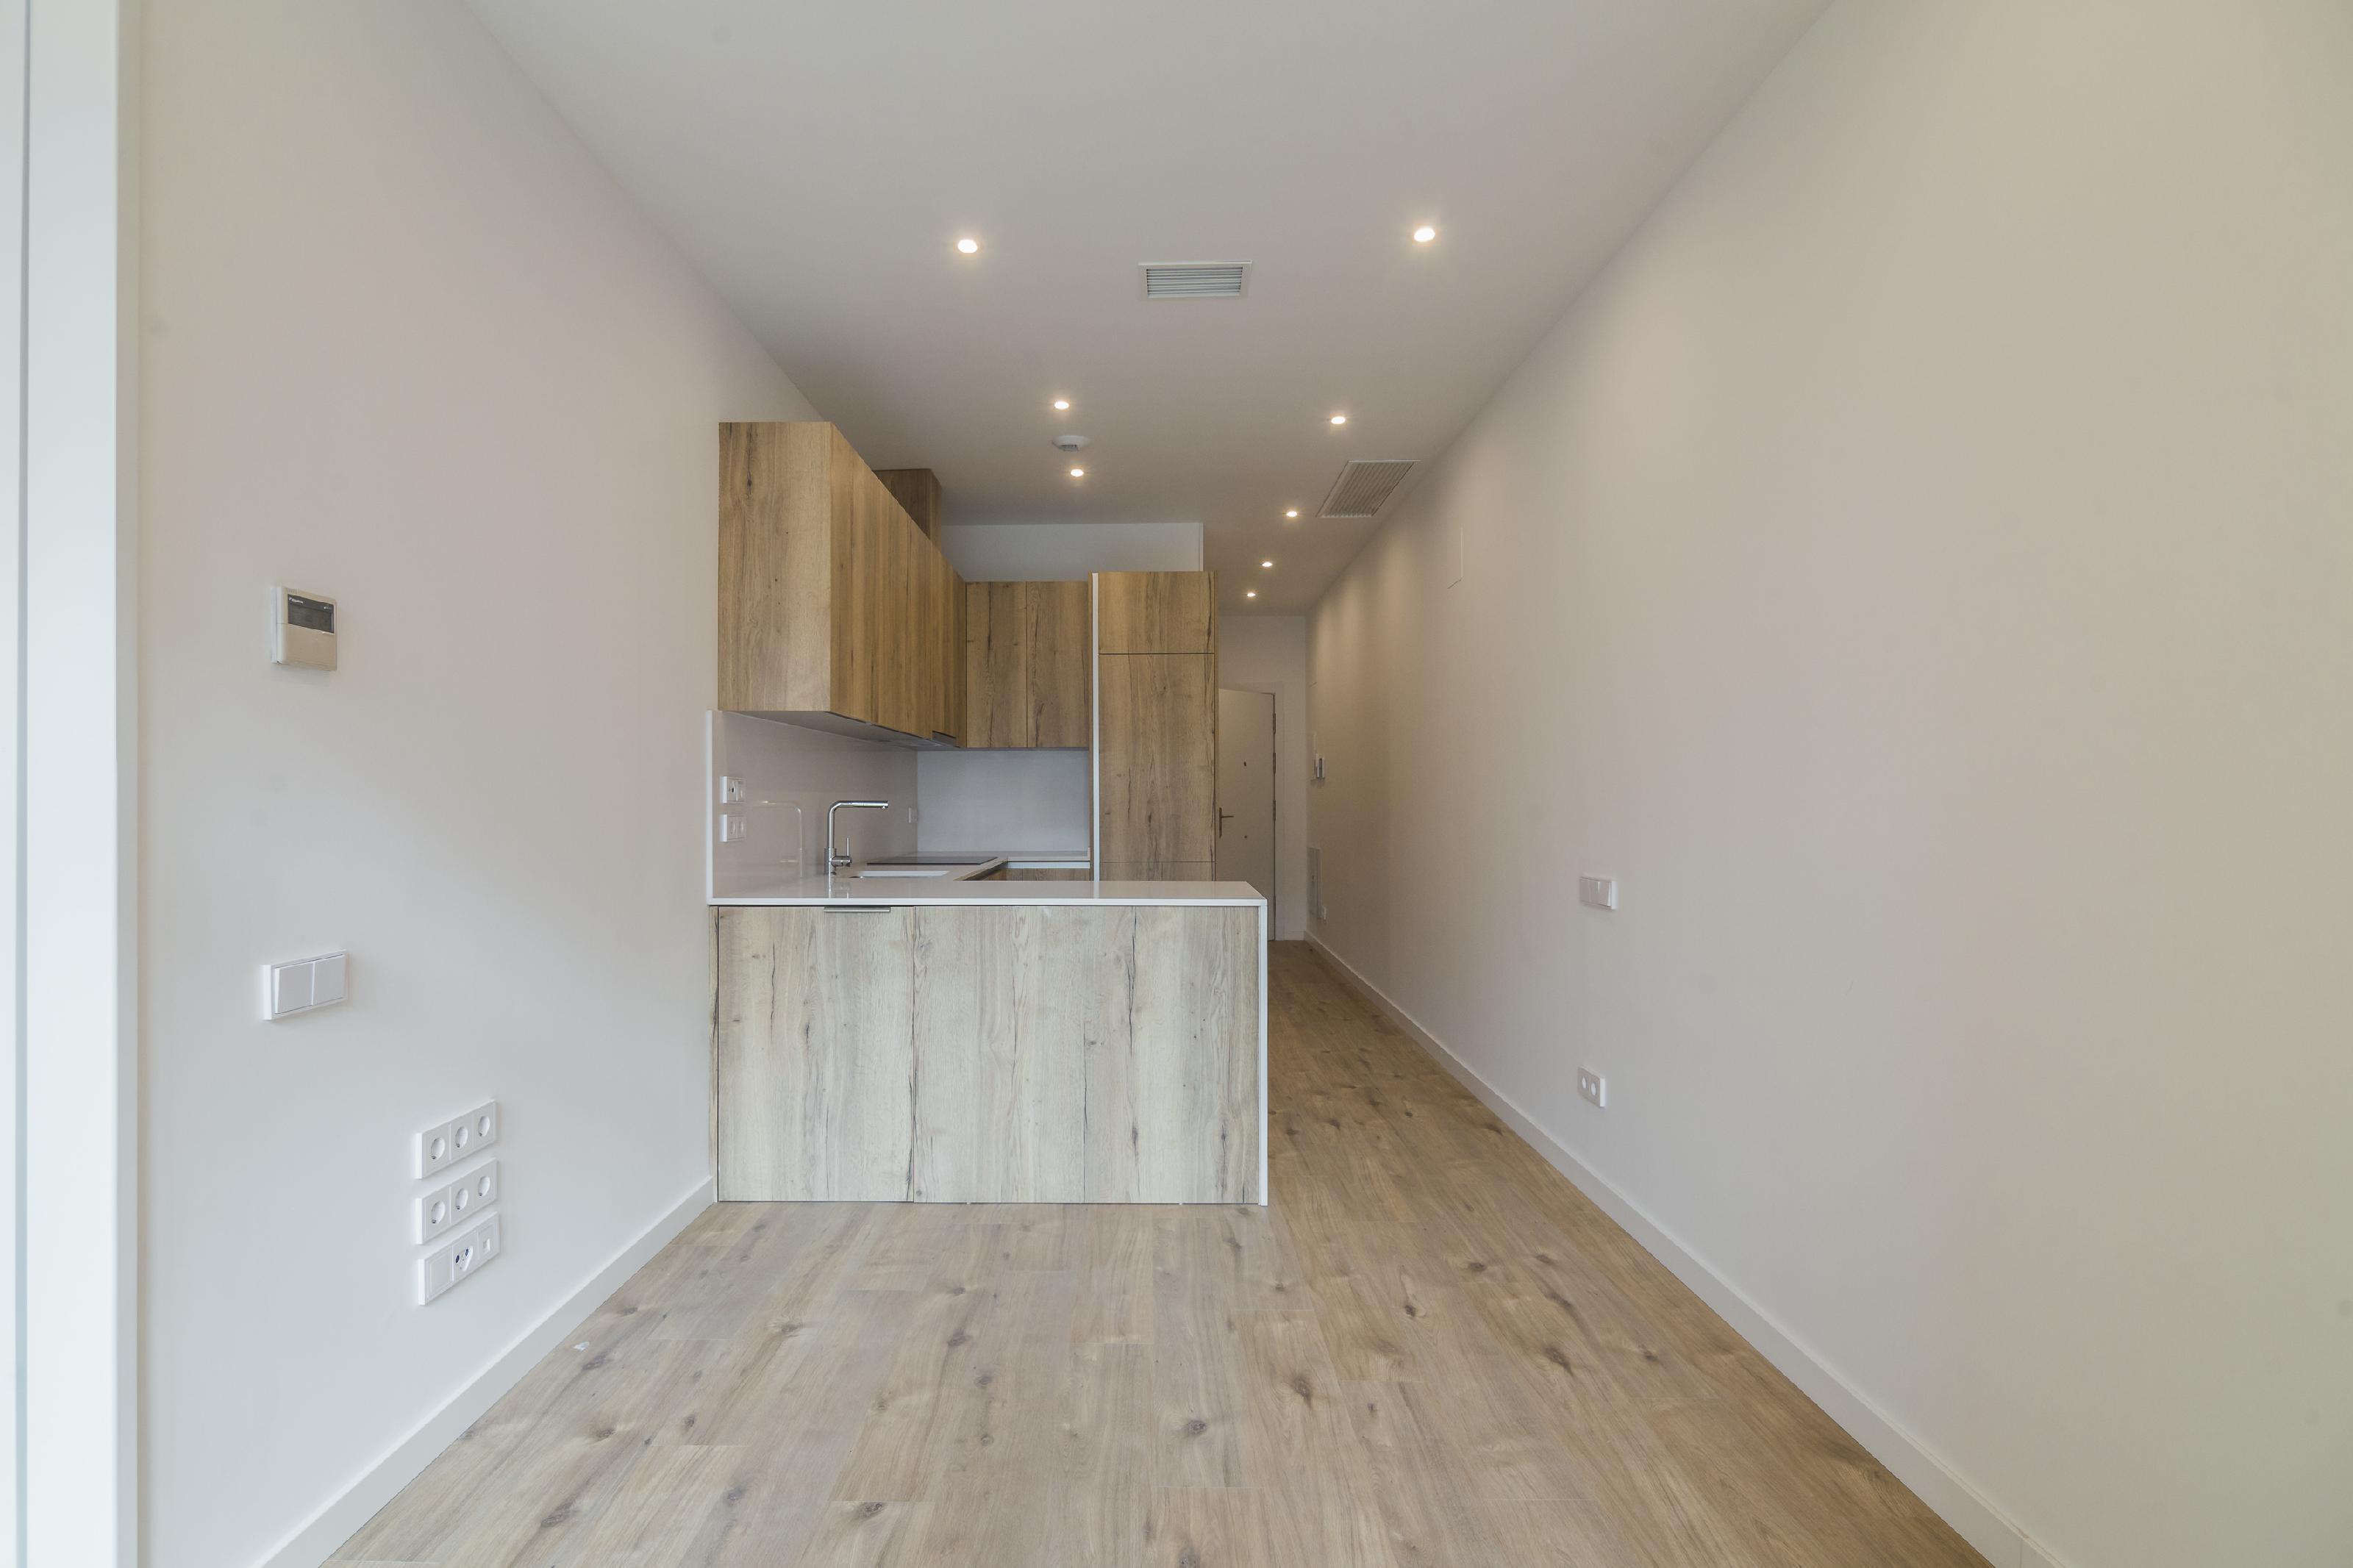 249858 Flat for sale in Eixample, Nova Esquerra Eixample 15